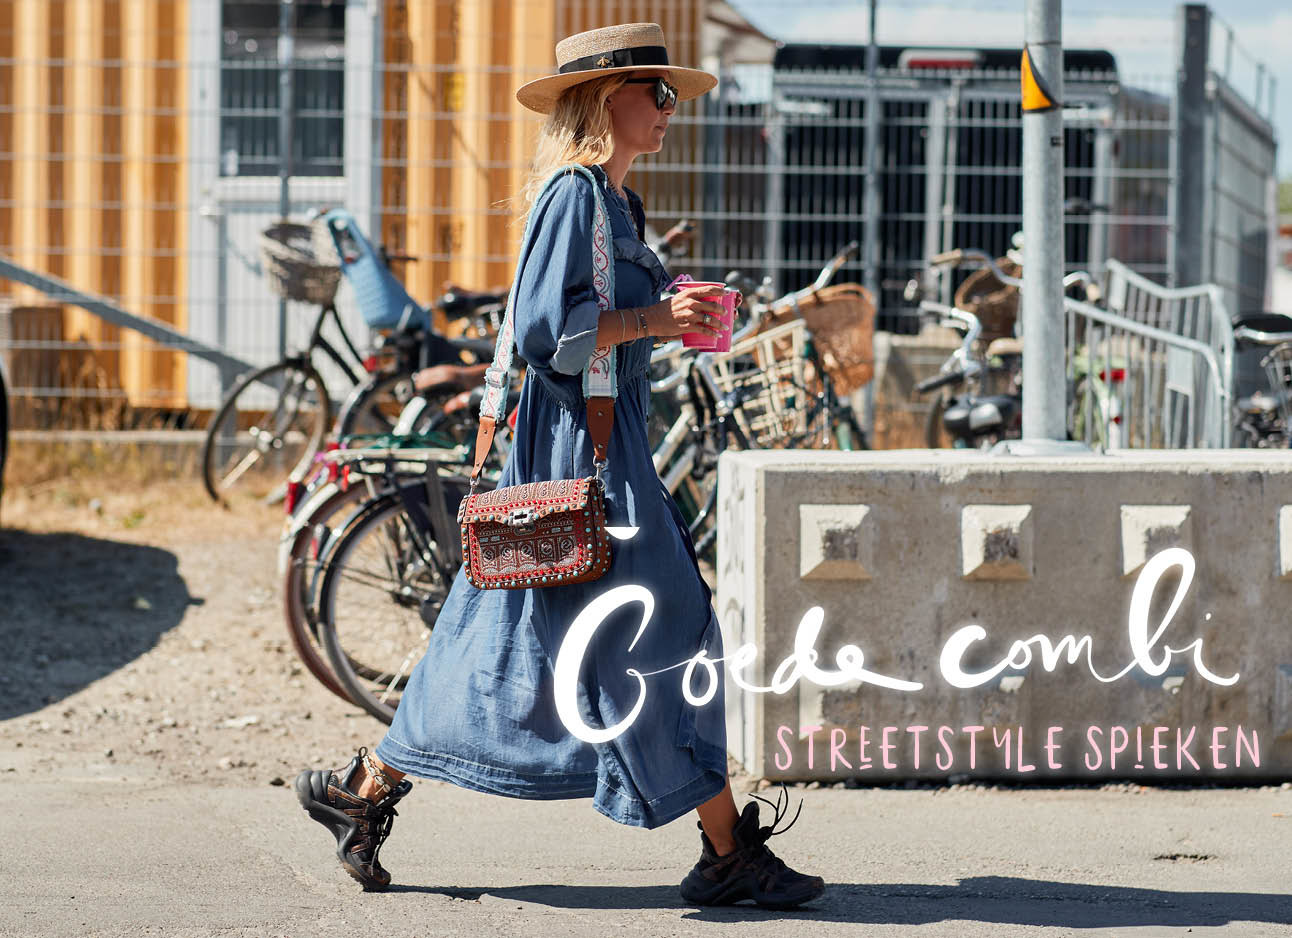 streetstyle spieken, vrouw in jeans jurk, chunky sneakers, hoedje, zonnebril, goede combi